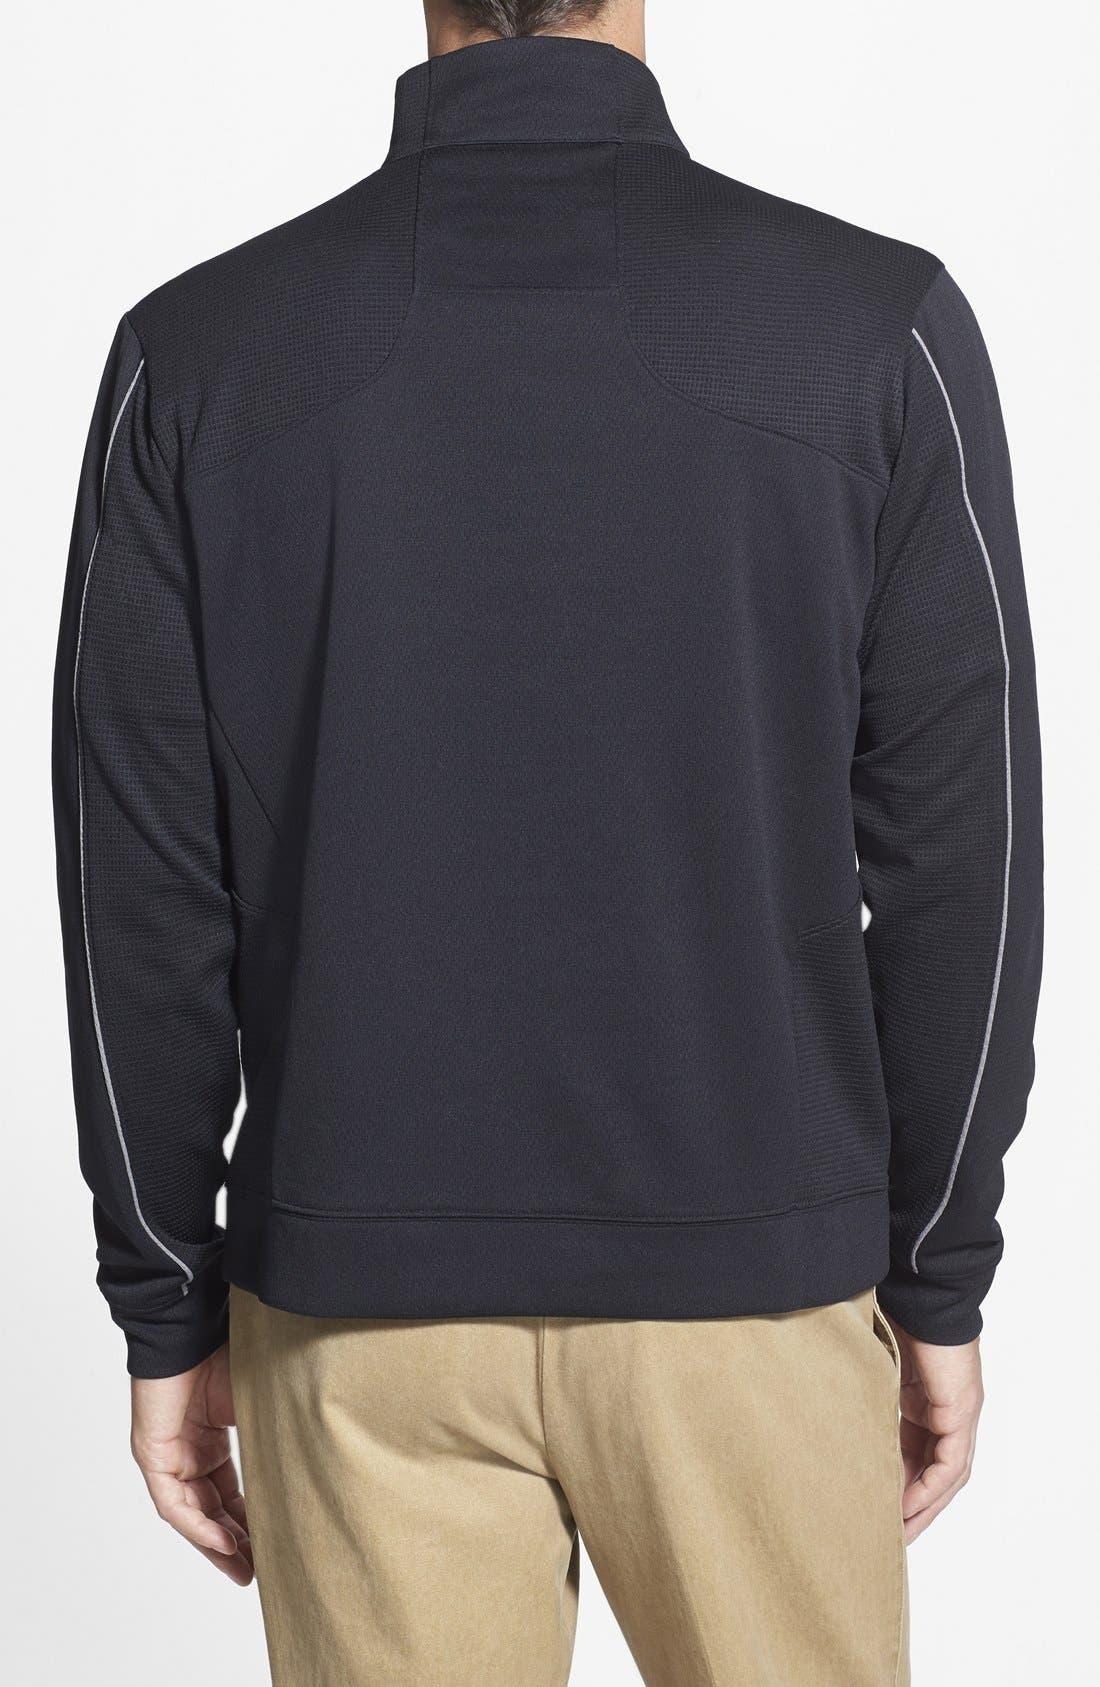 Washington DC NFL Team - Edge DryTec Moisture Wicking Half Zip Pullover,                             Alternate thumbnail 2, color,                             001